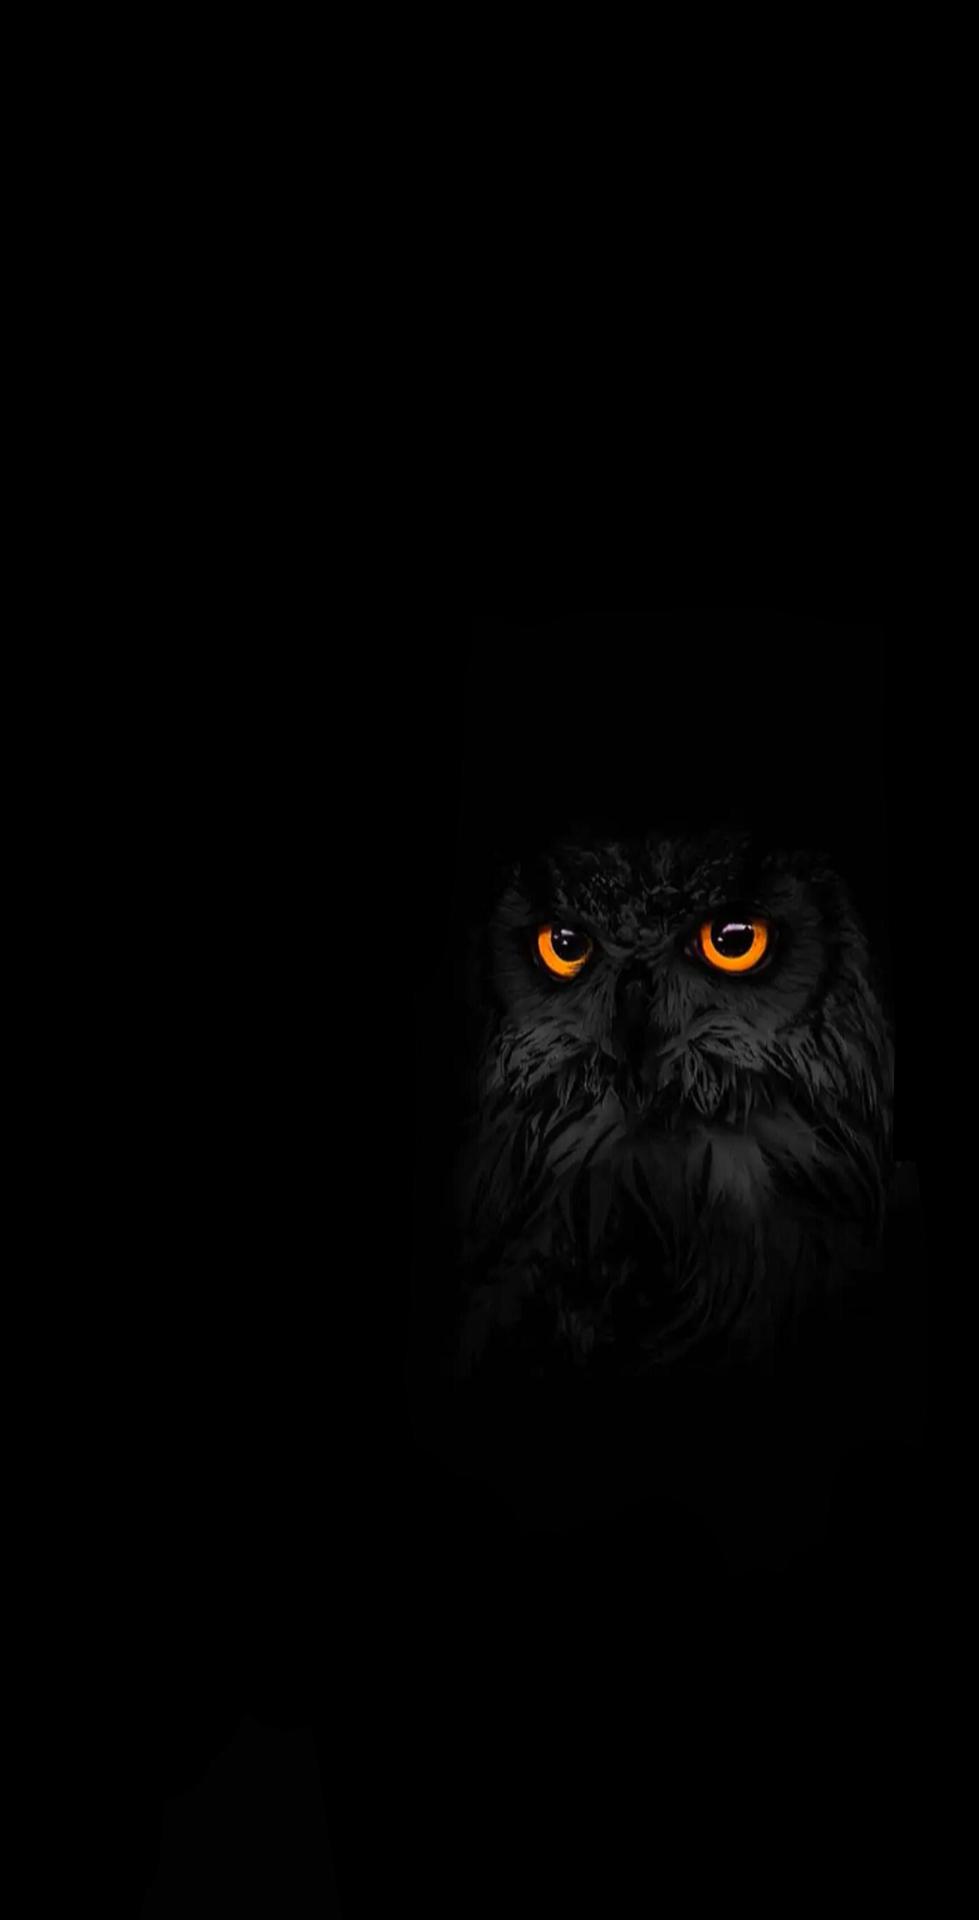 Mennyfox55 Owl Artwork Cute Owls Wallpaper Owl Wallpaper Iphone